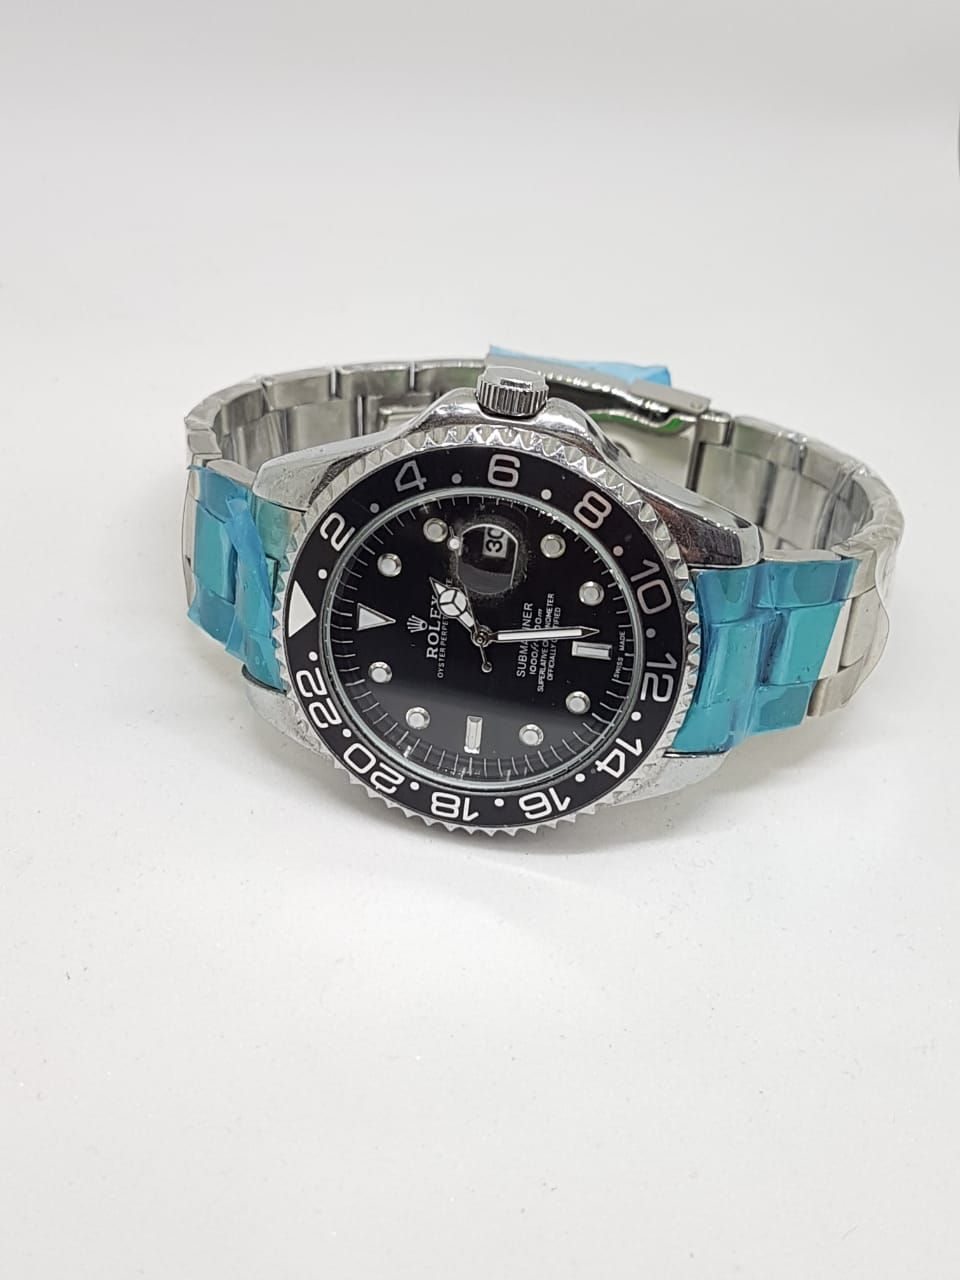 Account Suspended Rolex Watches Bracelet Watch Accessories